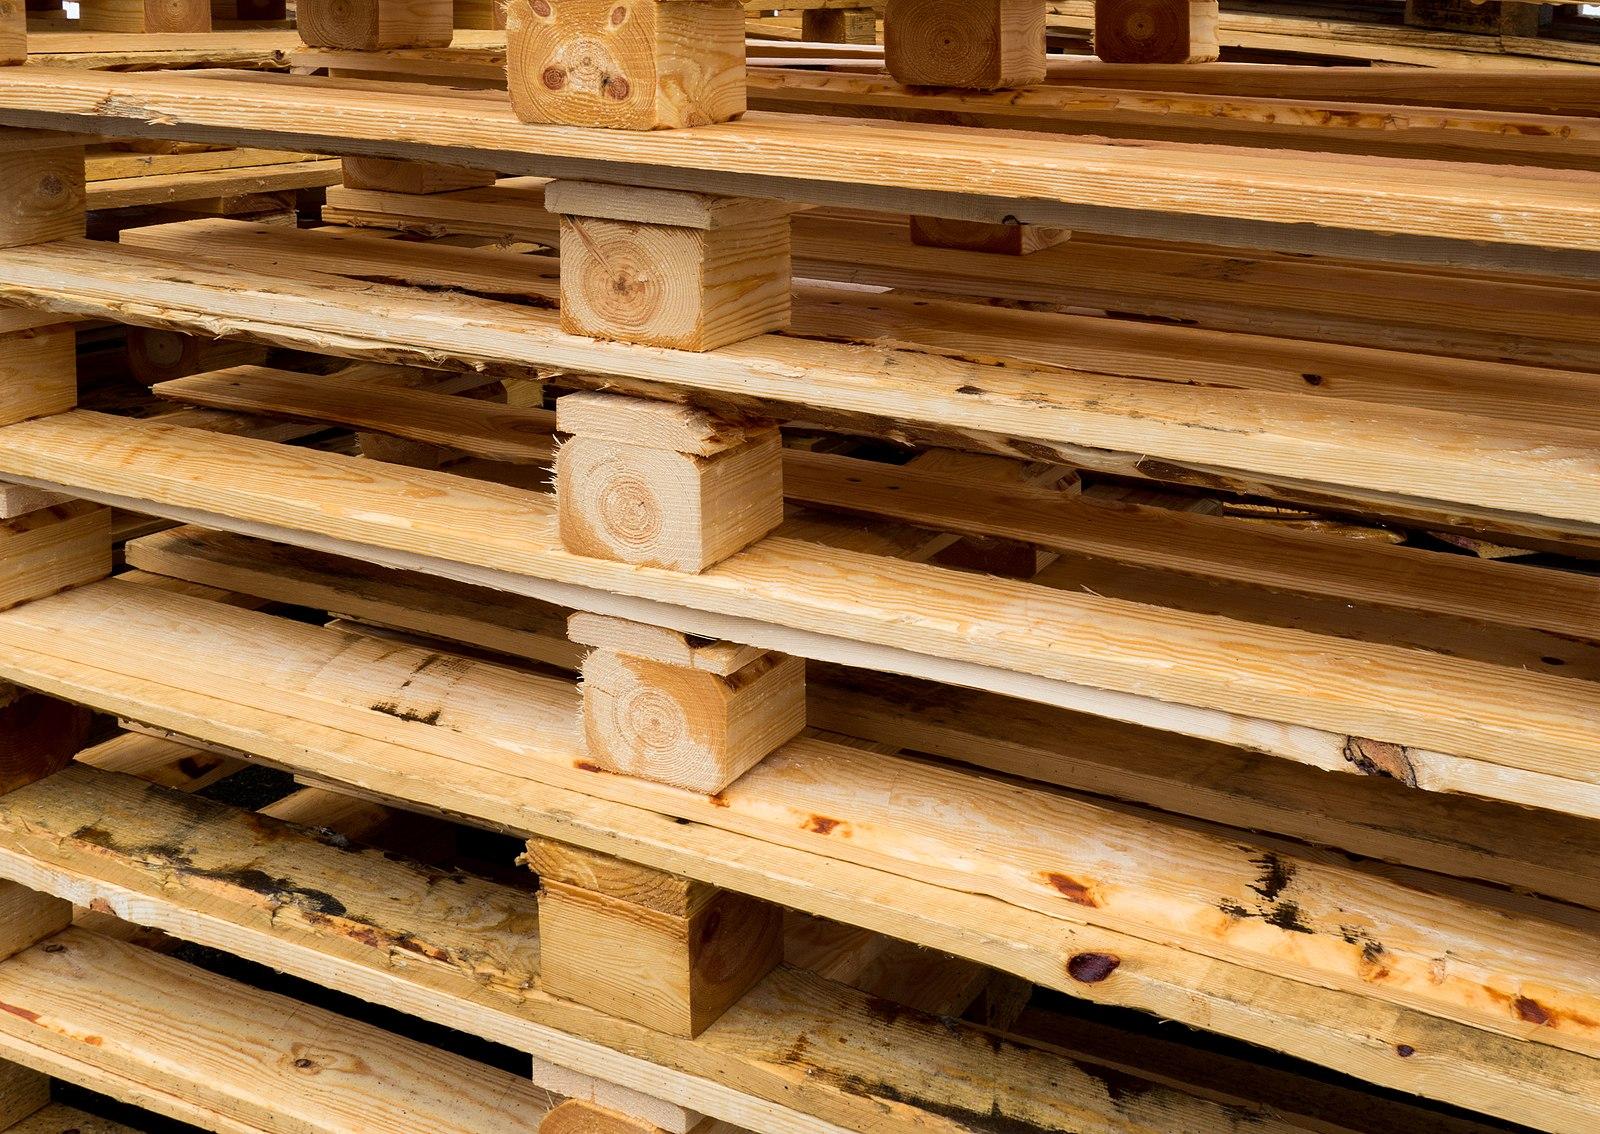 Wood vs Plastic Pallets